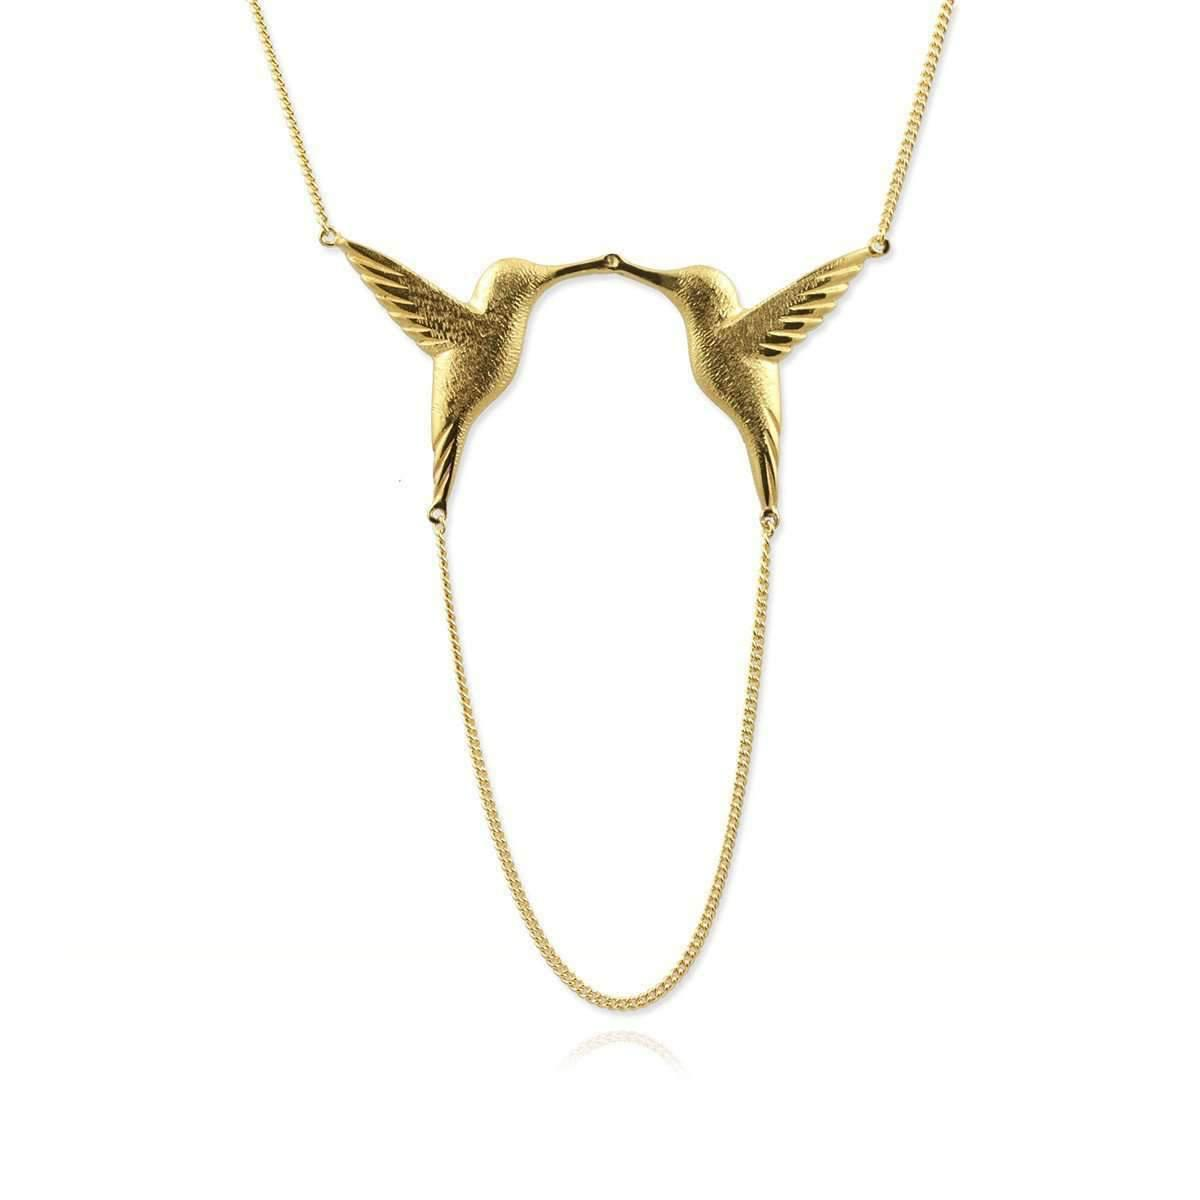 Jana Reinhardt Gold Plated Silver Twin Hummingbird Necklace 328vLoO